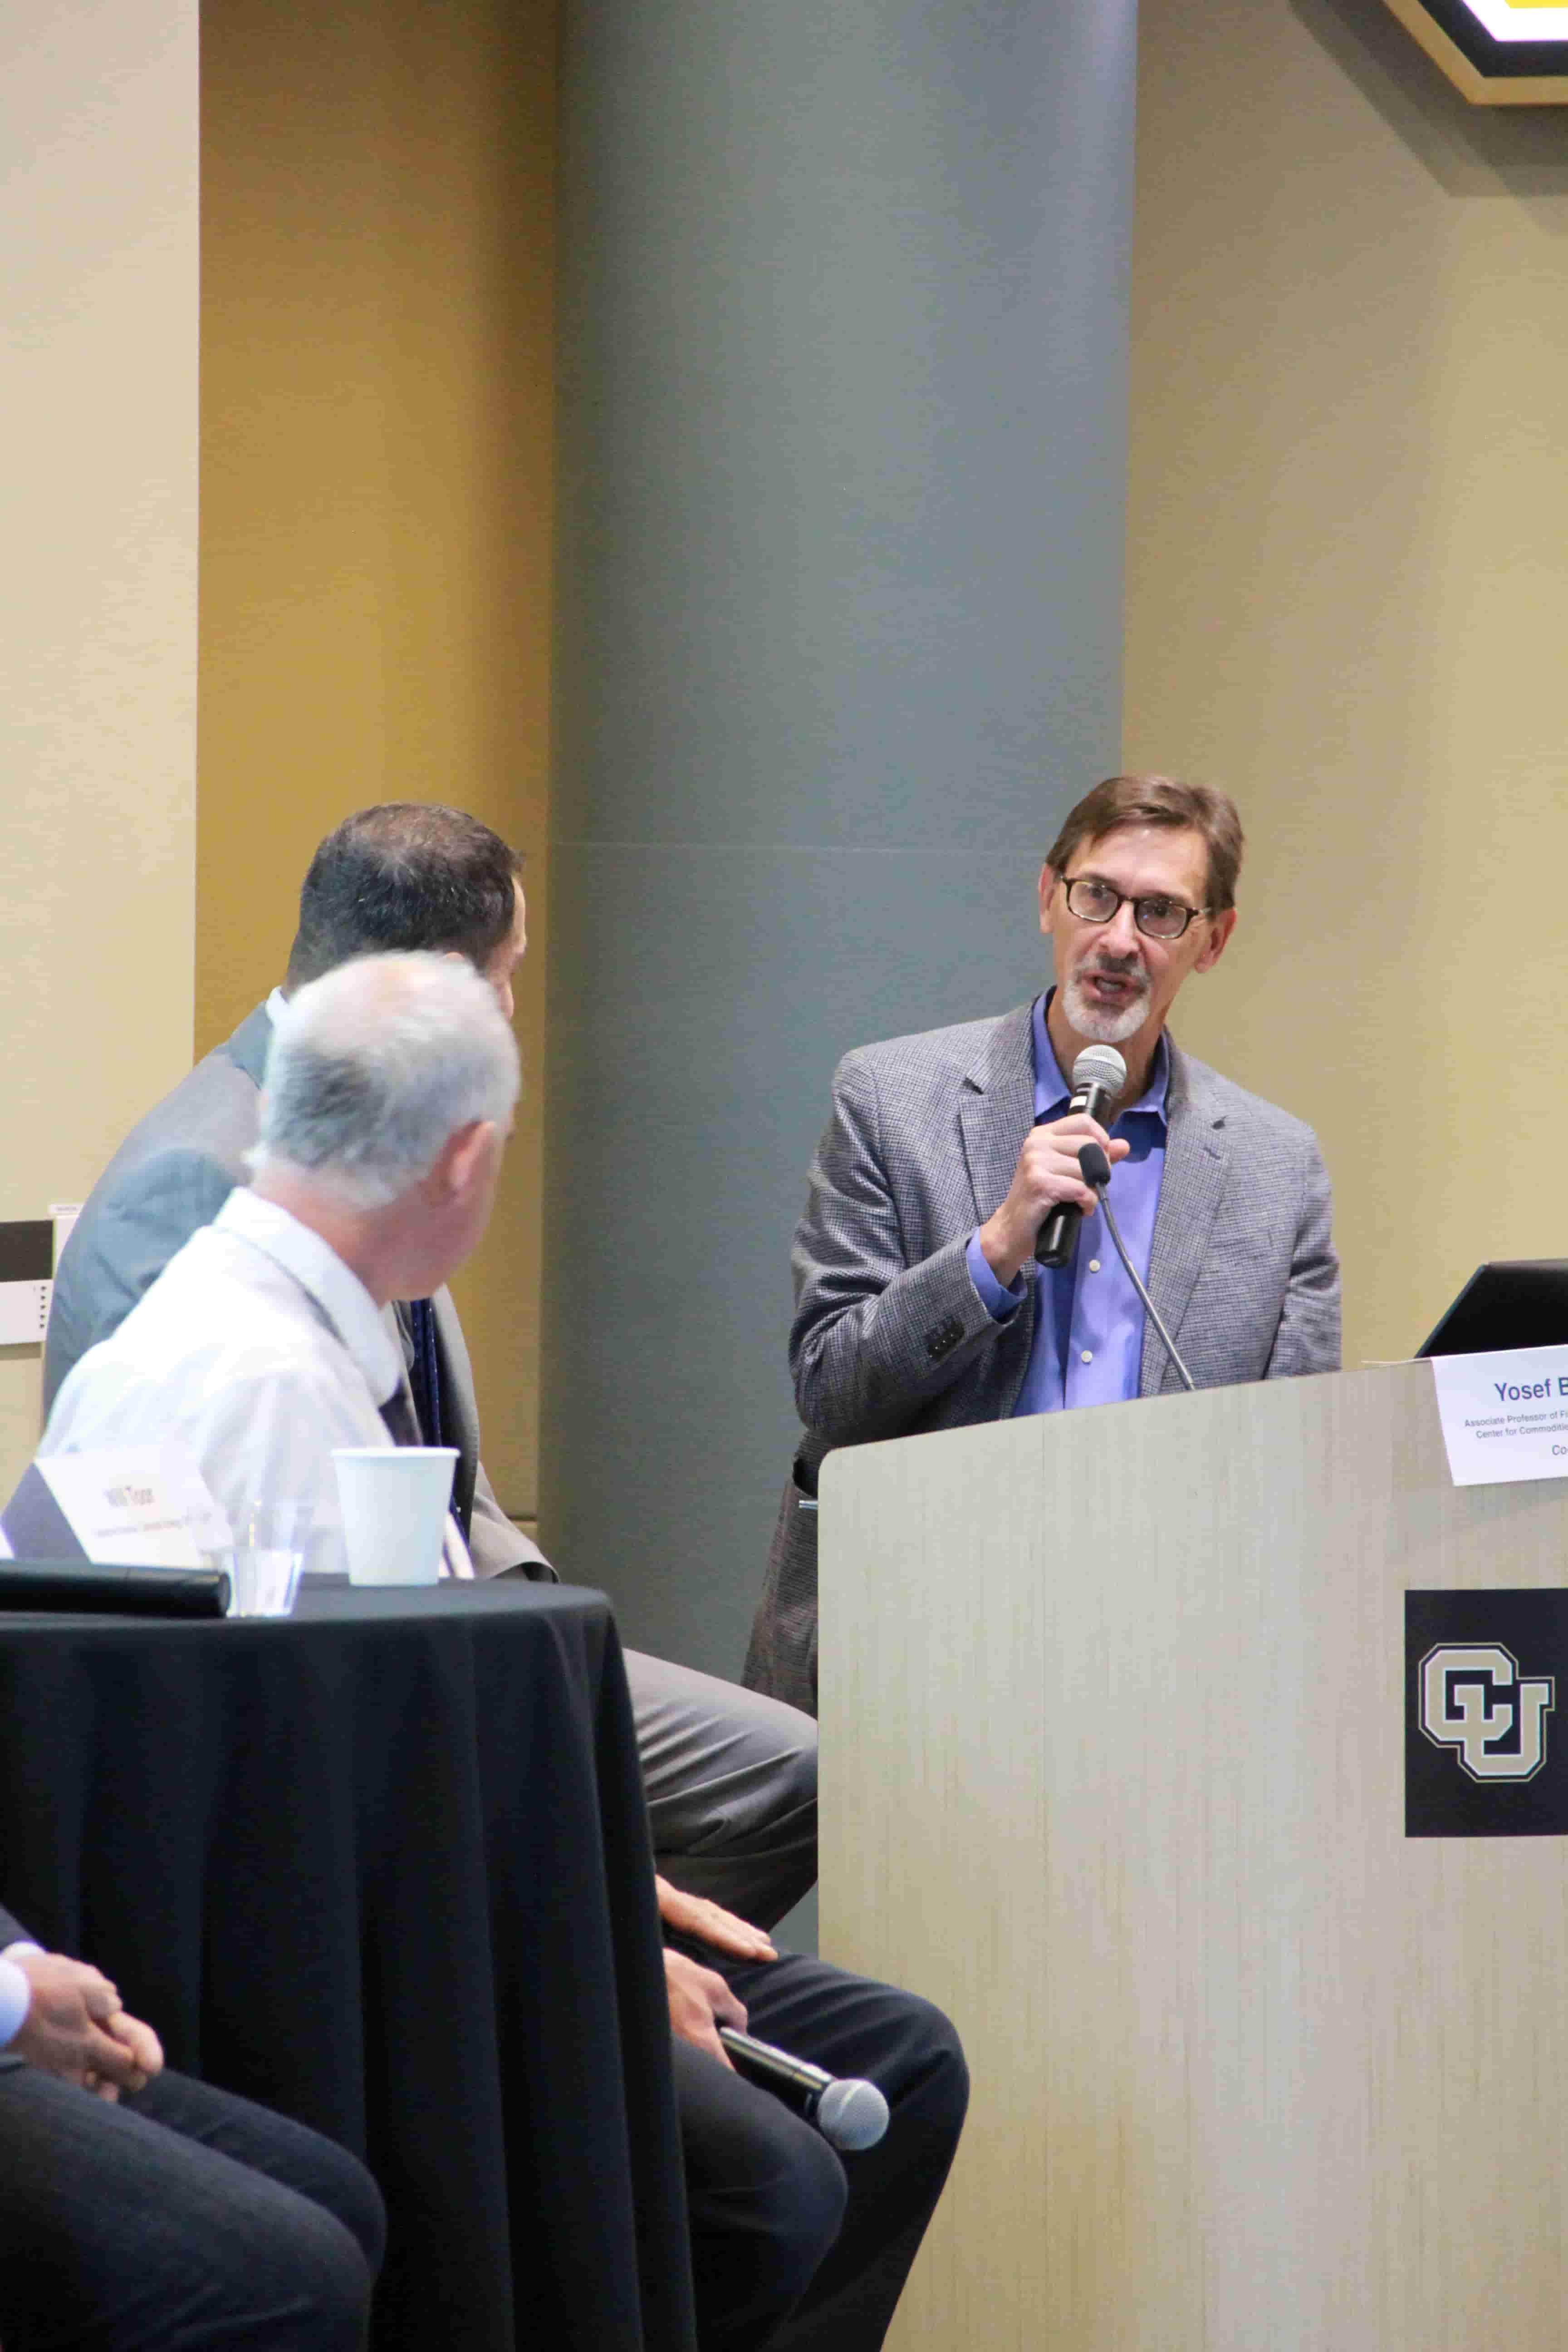 Mark Safty, Wirth Chair in Sustainable Development at CU Denver School of Public Affairs